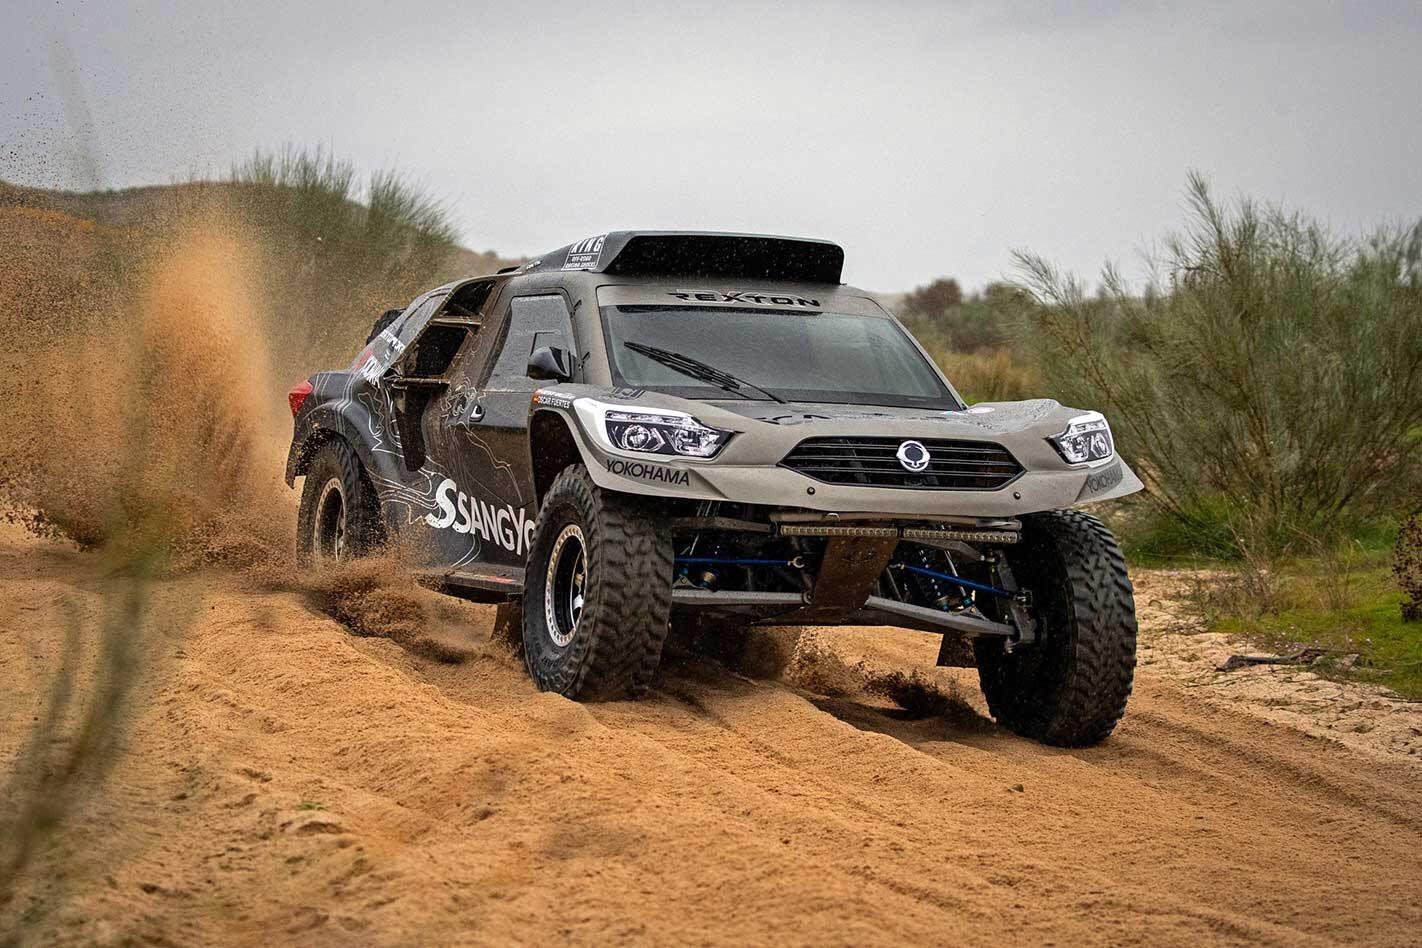 SsangYong Rexton DKR to take on Dakar Rally